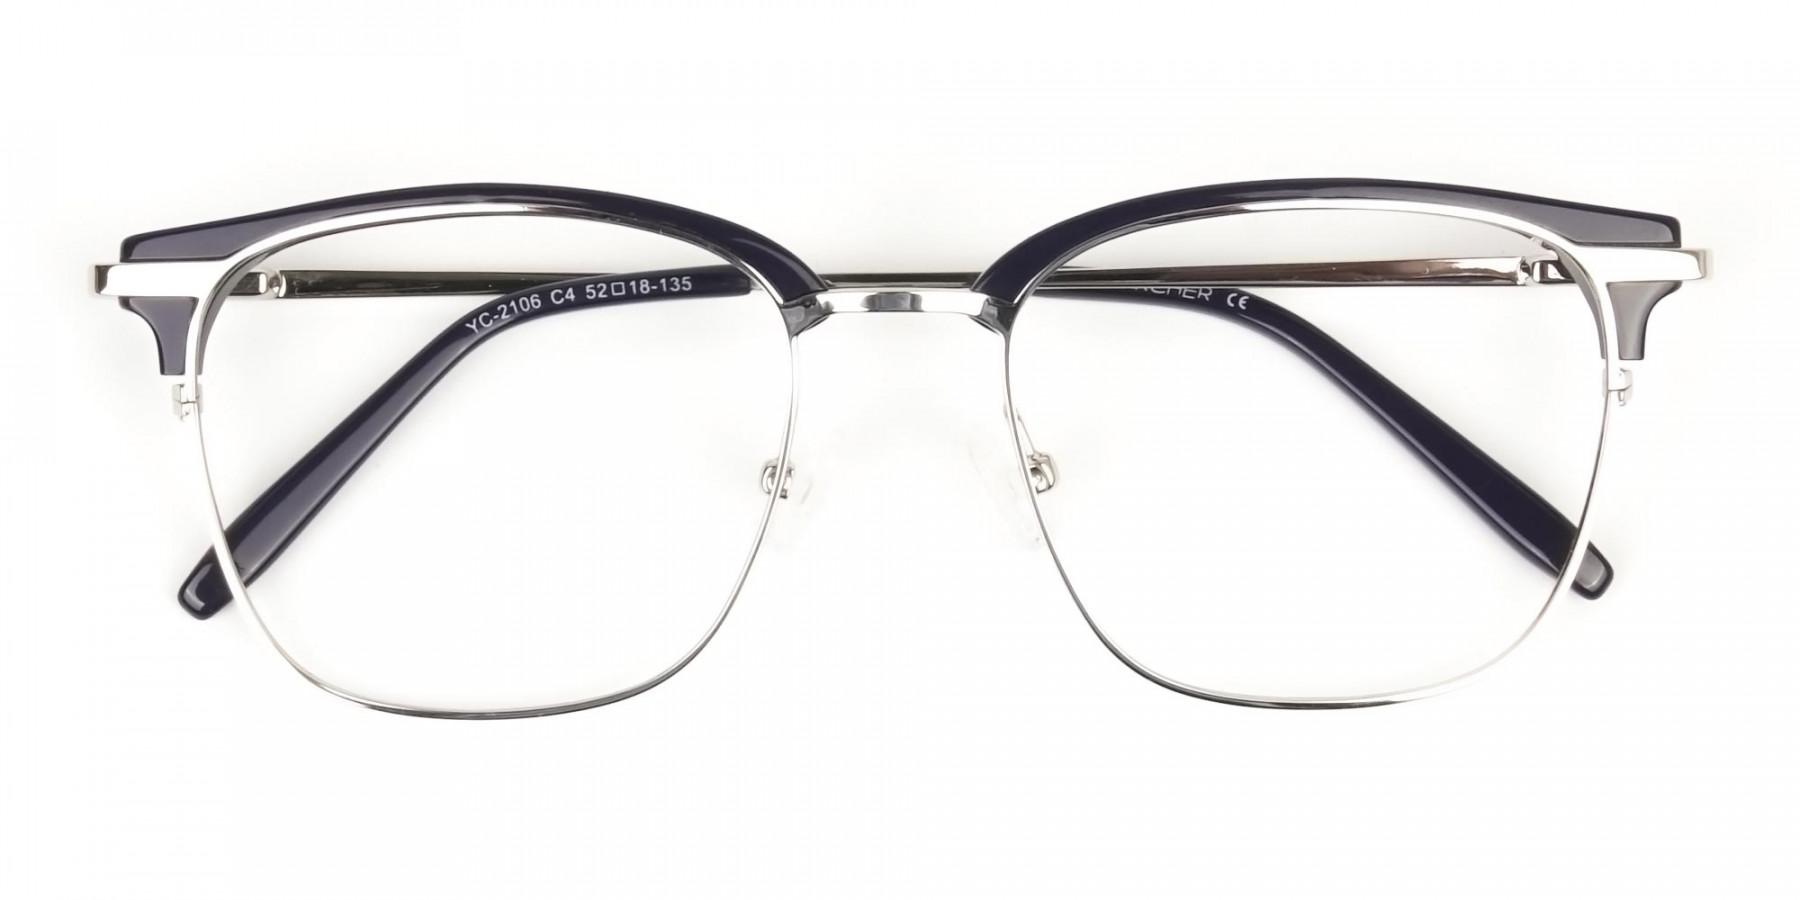 Wayfarer Silver & Indigo Blue Clubmaster Frames - 1